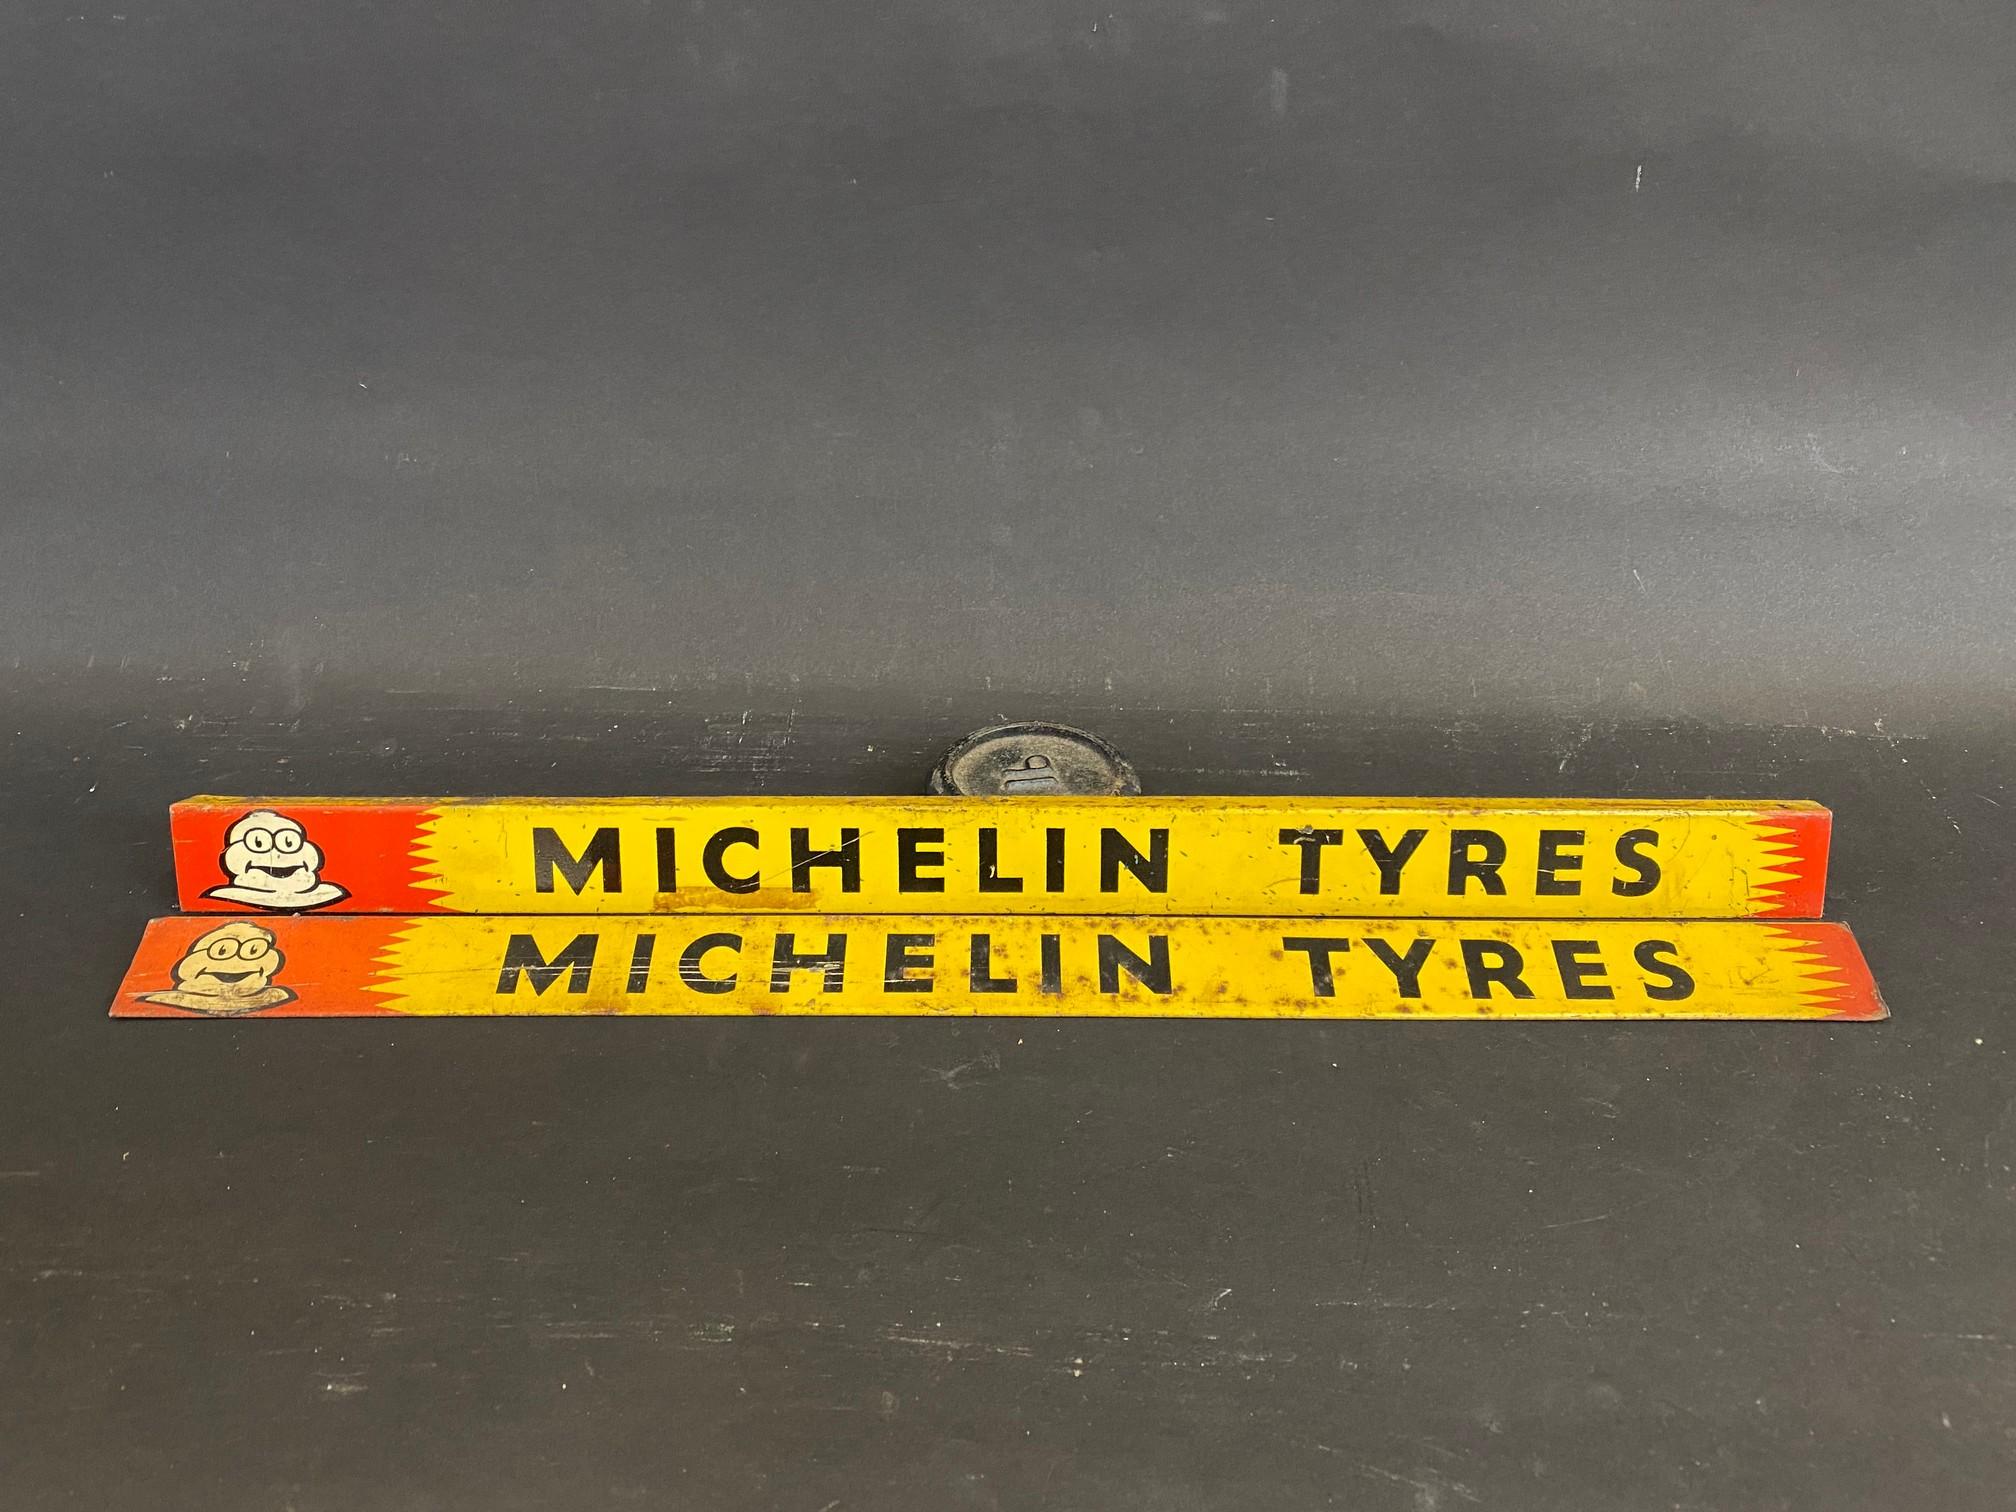 Two Michelin Tyres shelf strips.